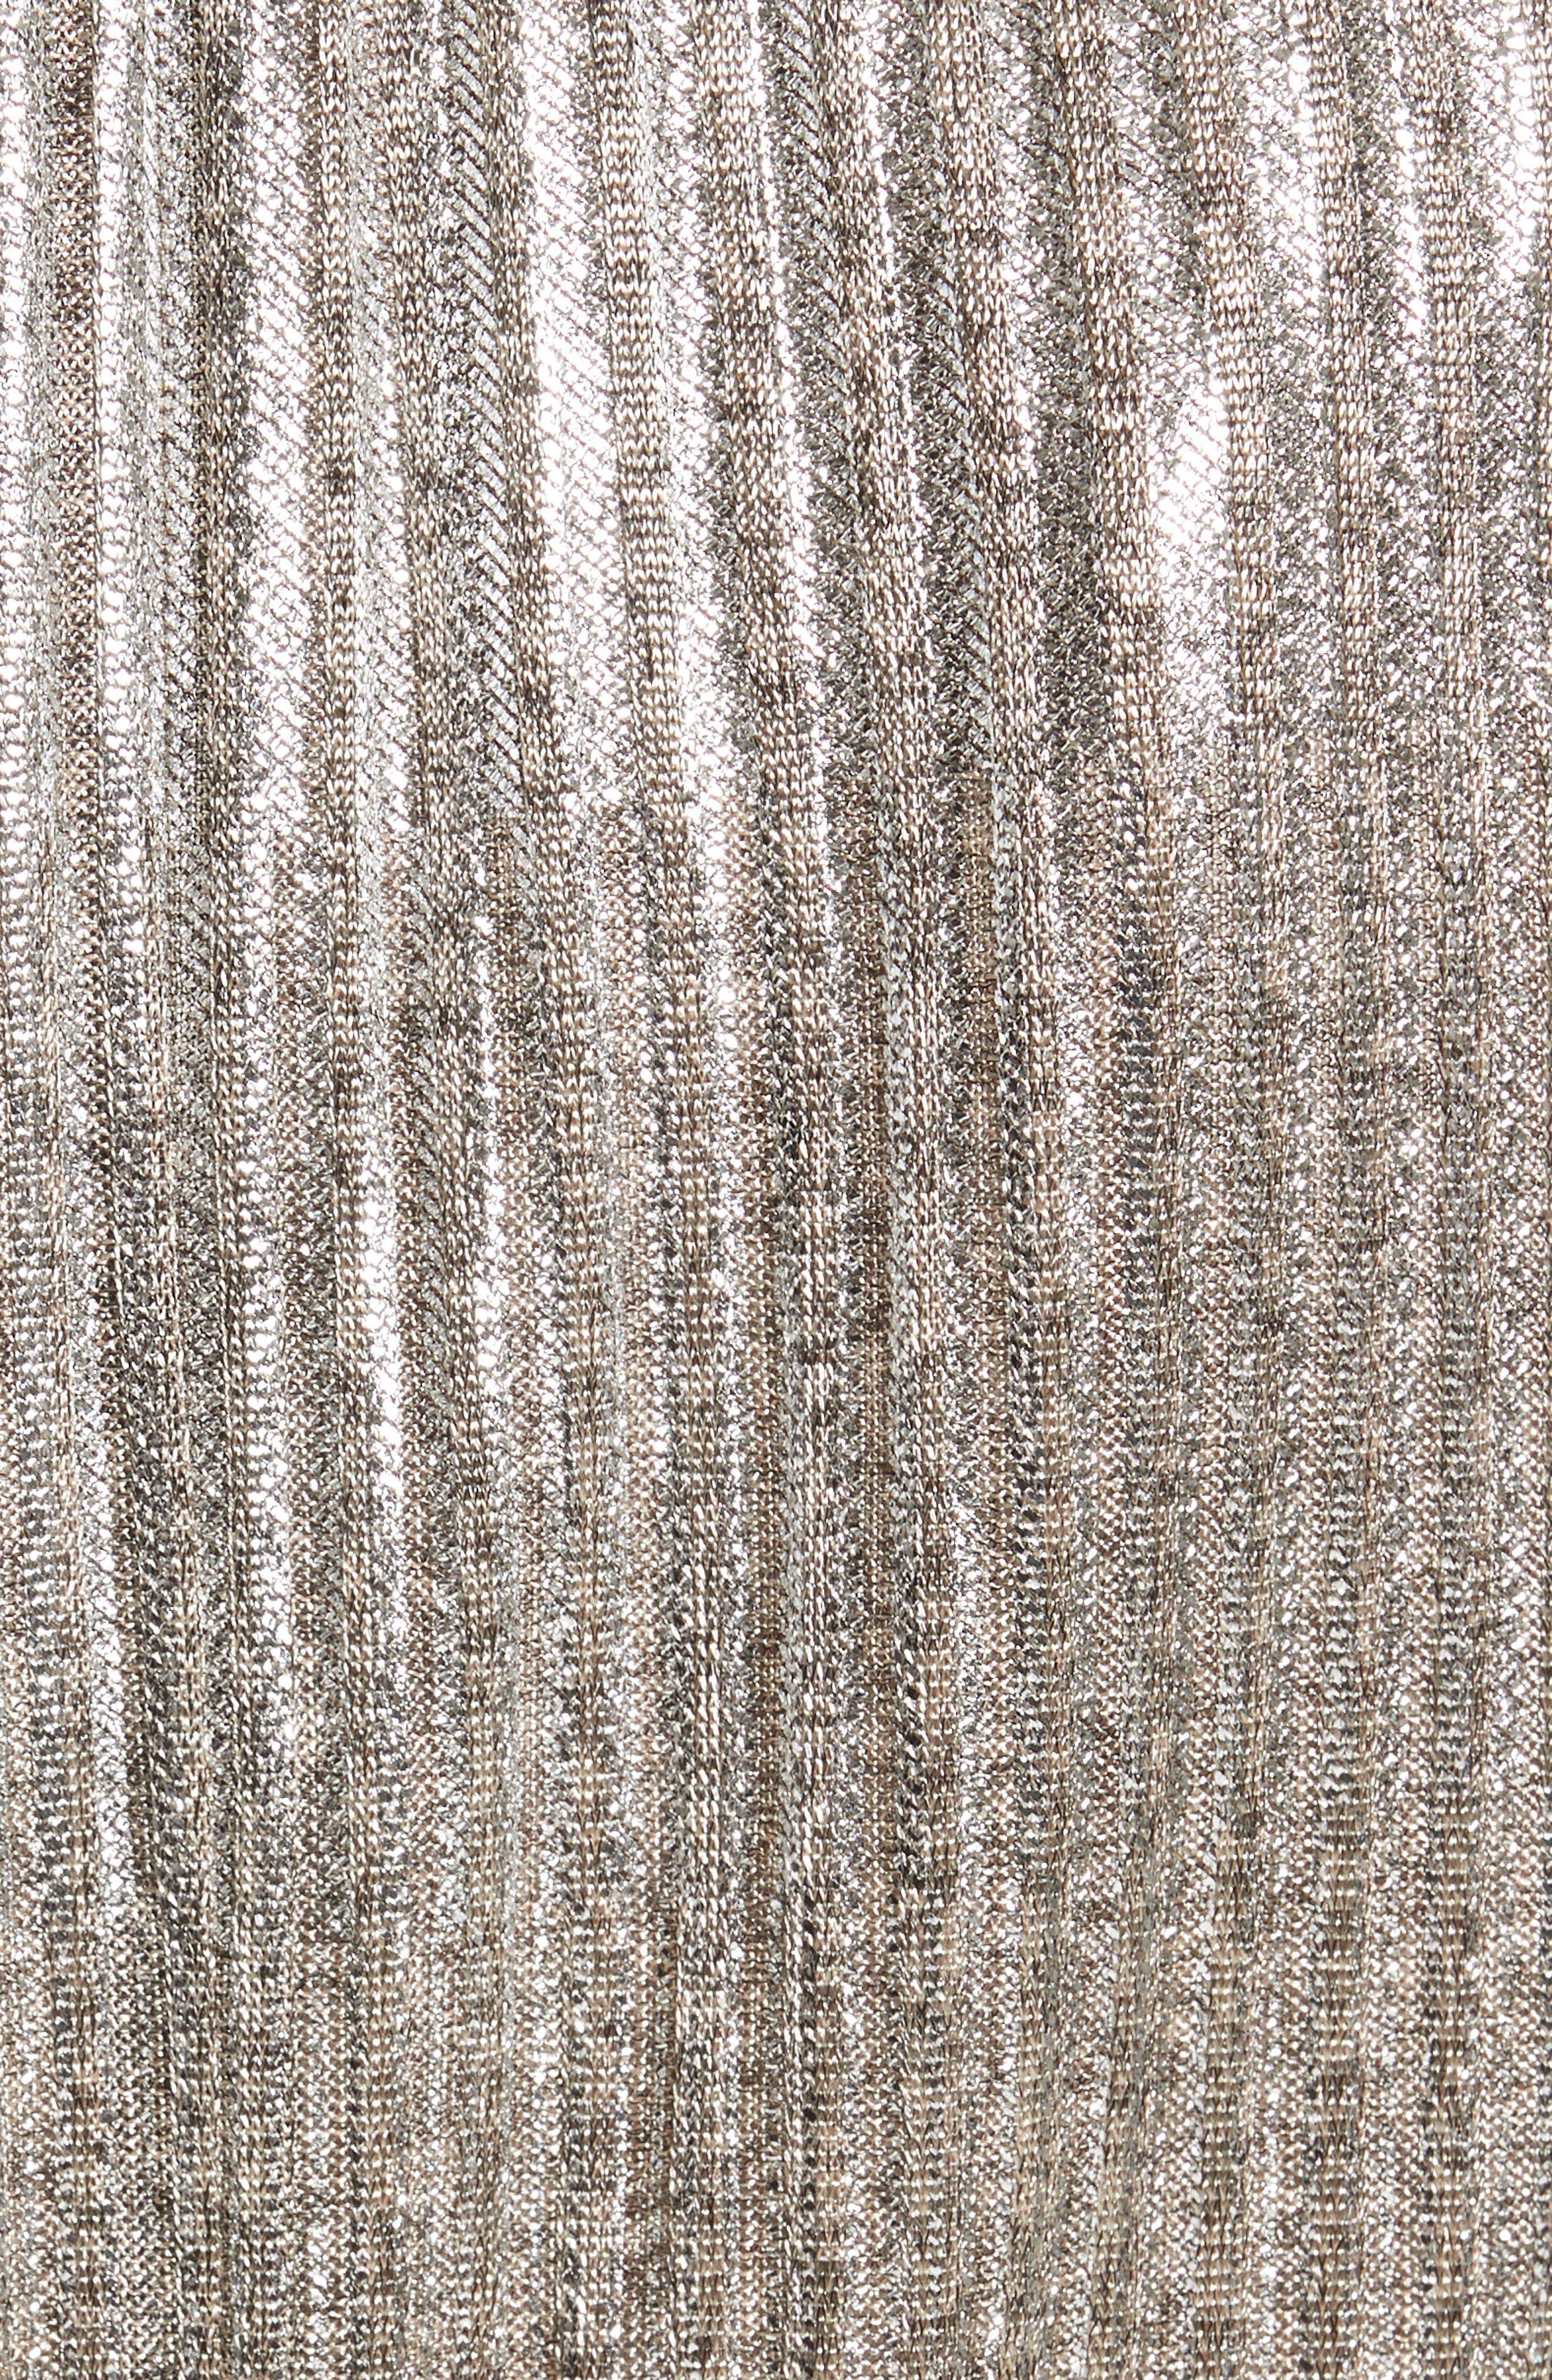 Katina Metallic Wrap Dress,                             Alternate thumbnail 5, color,                             712